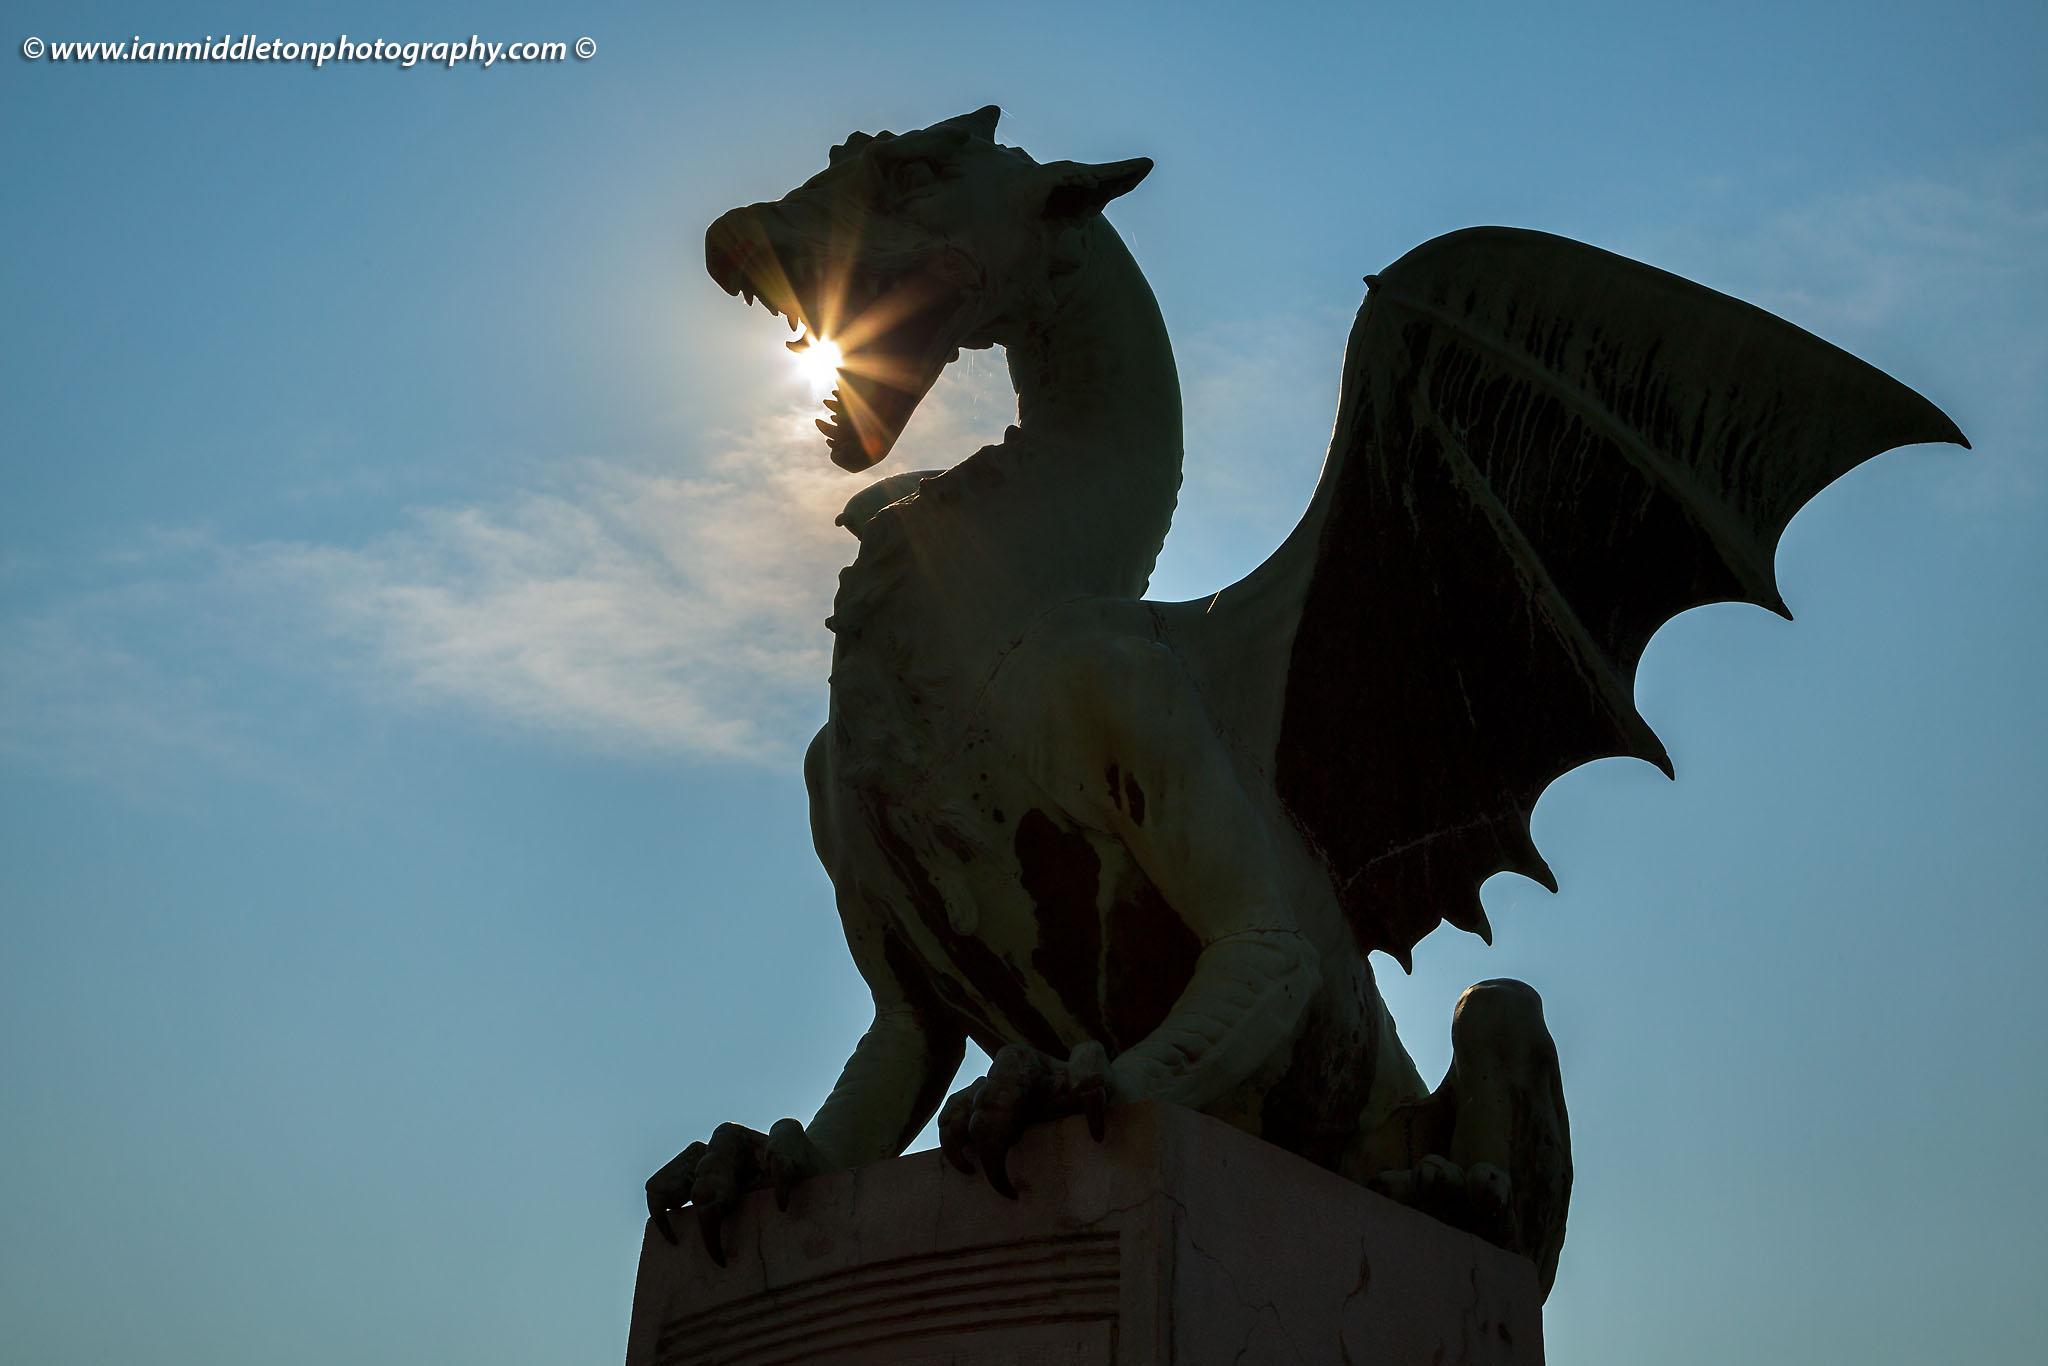 Sunburst through them mouth of a dragon on the Dragon Bridge in Ljubljana, Slovenia.